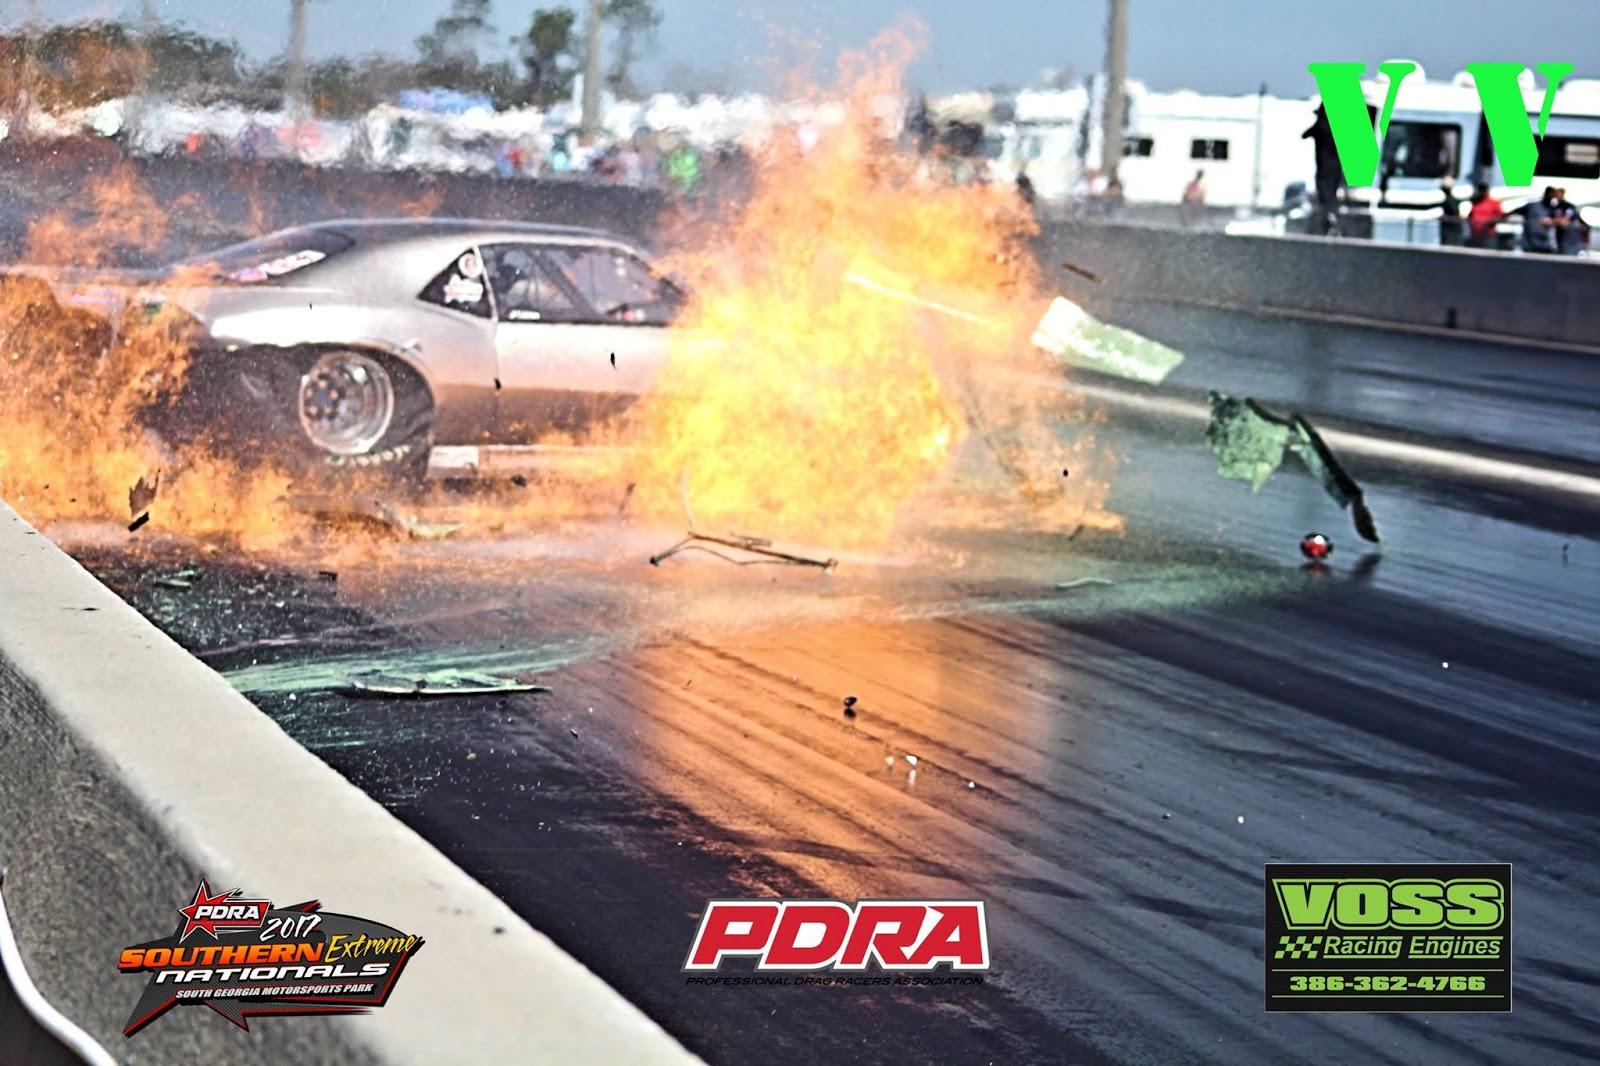 James Linton PDRA Southern Extreme Crash - VIDEO - RACE IT